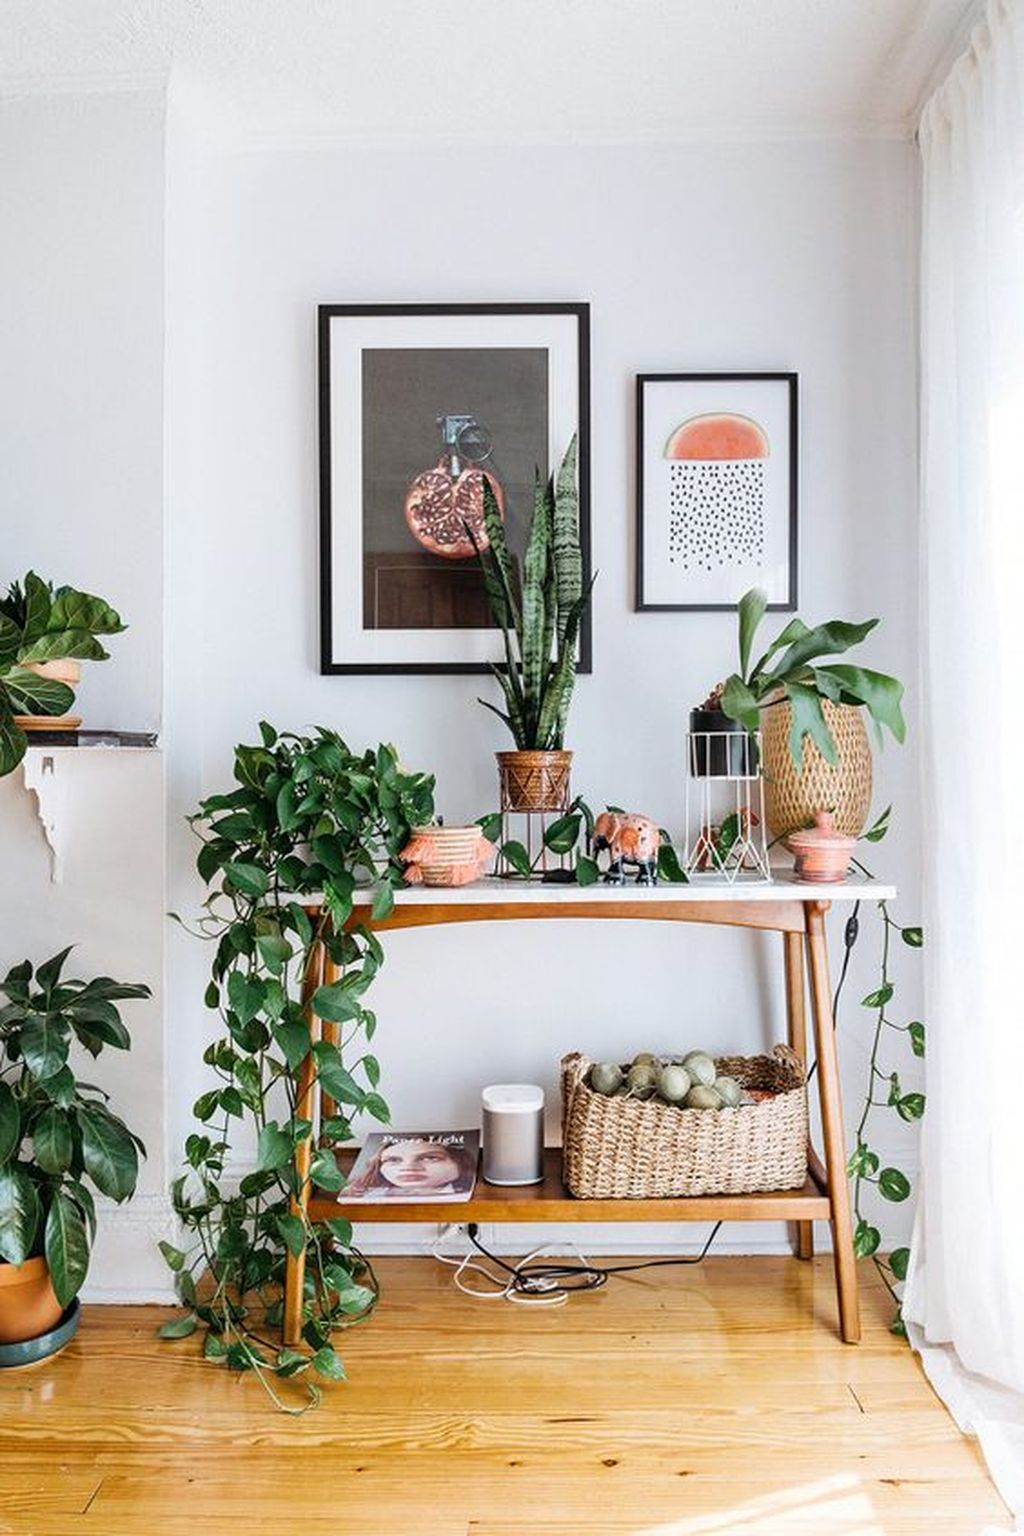 Inspiring Indoor Plans Garden Ideas To Makes Your Home More Cozier 58